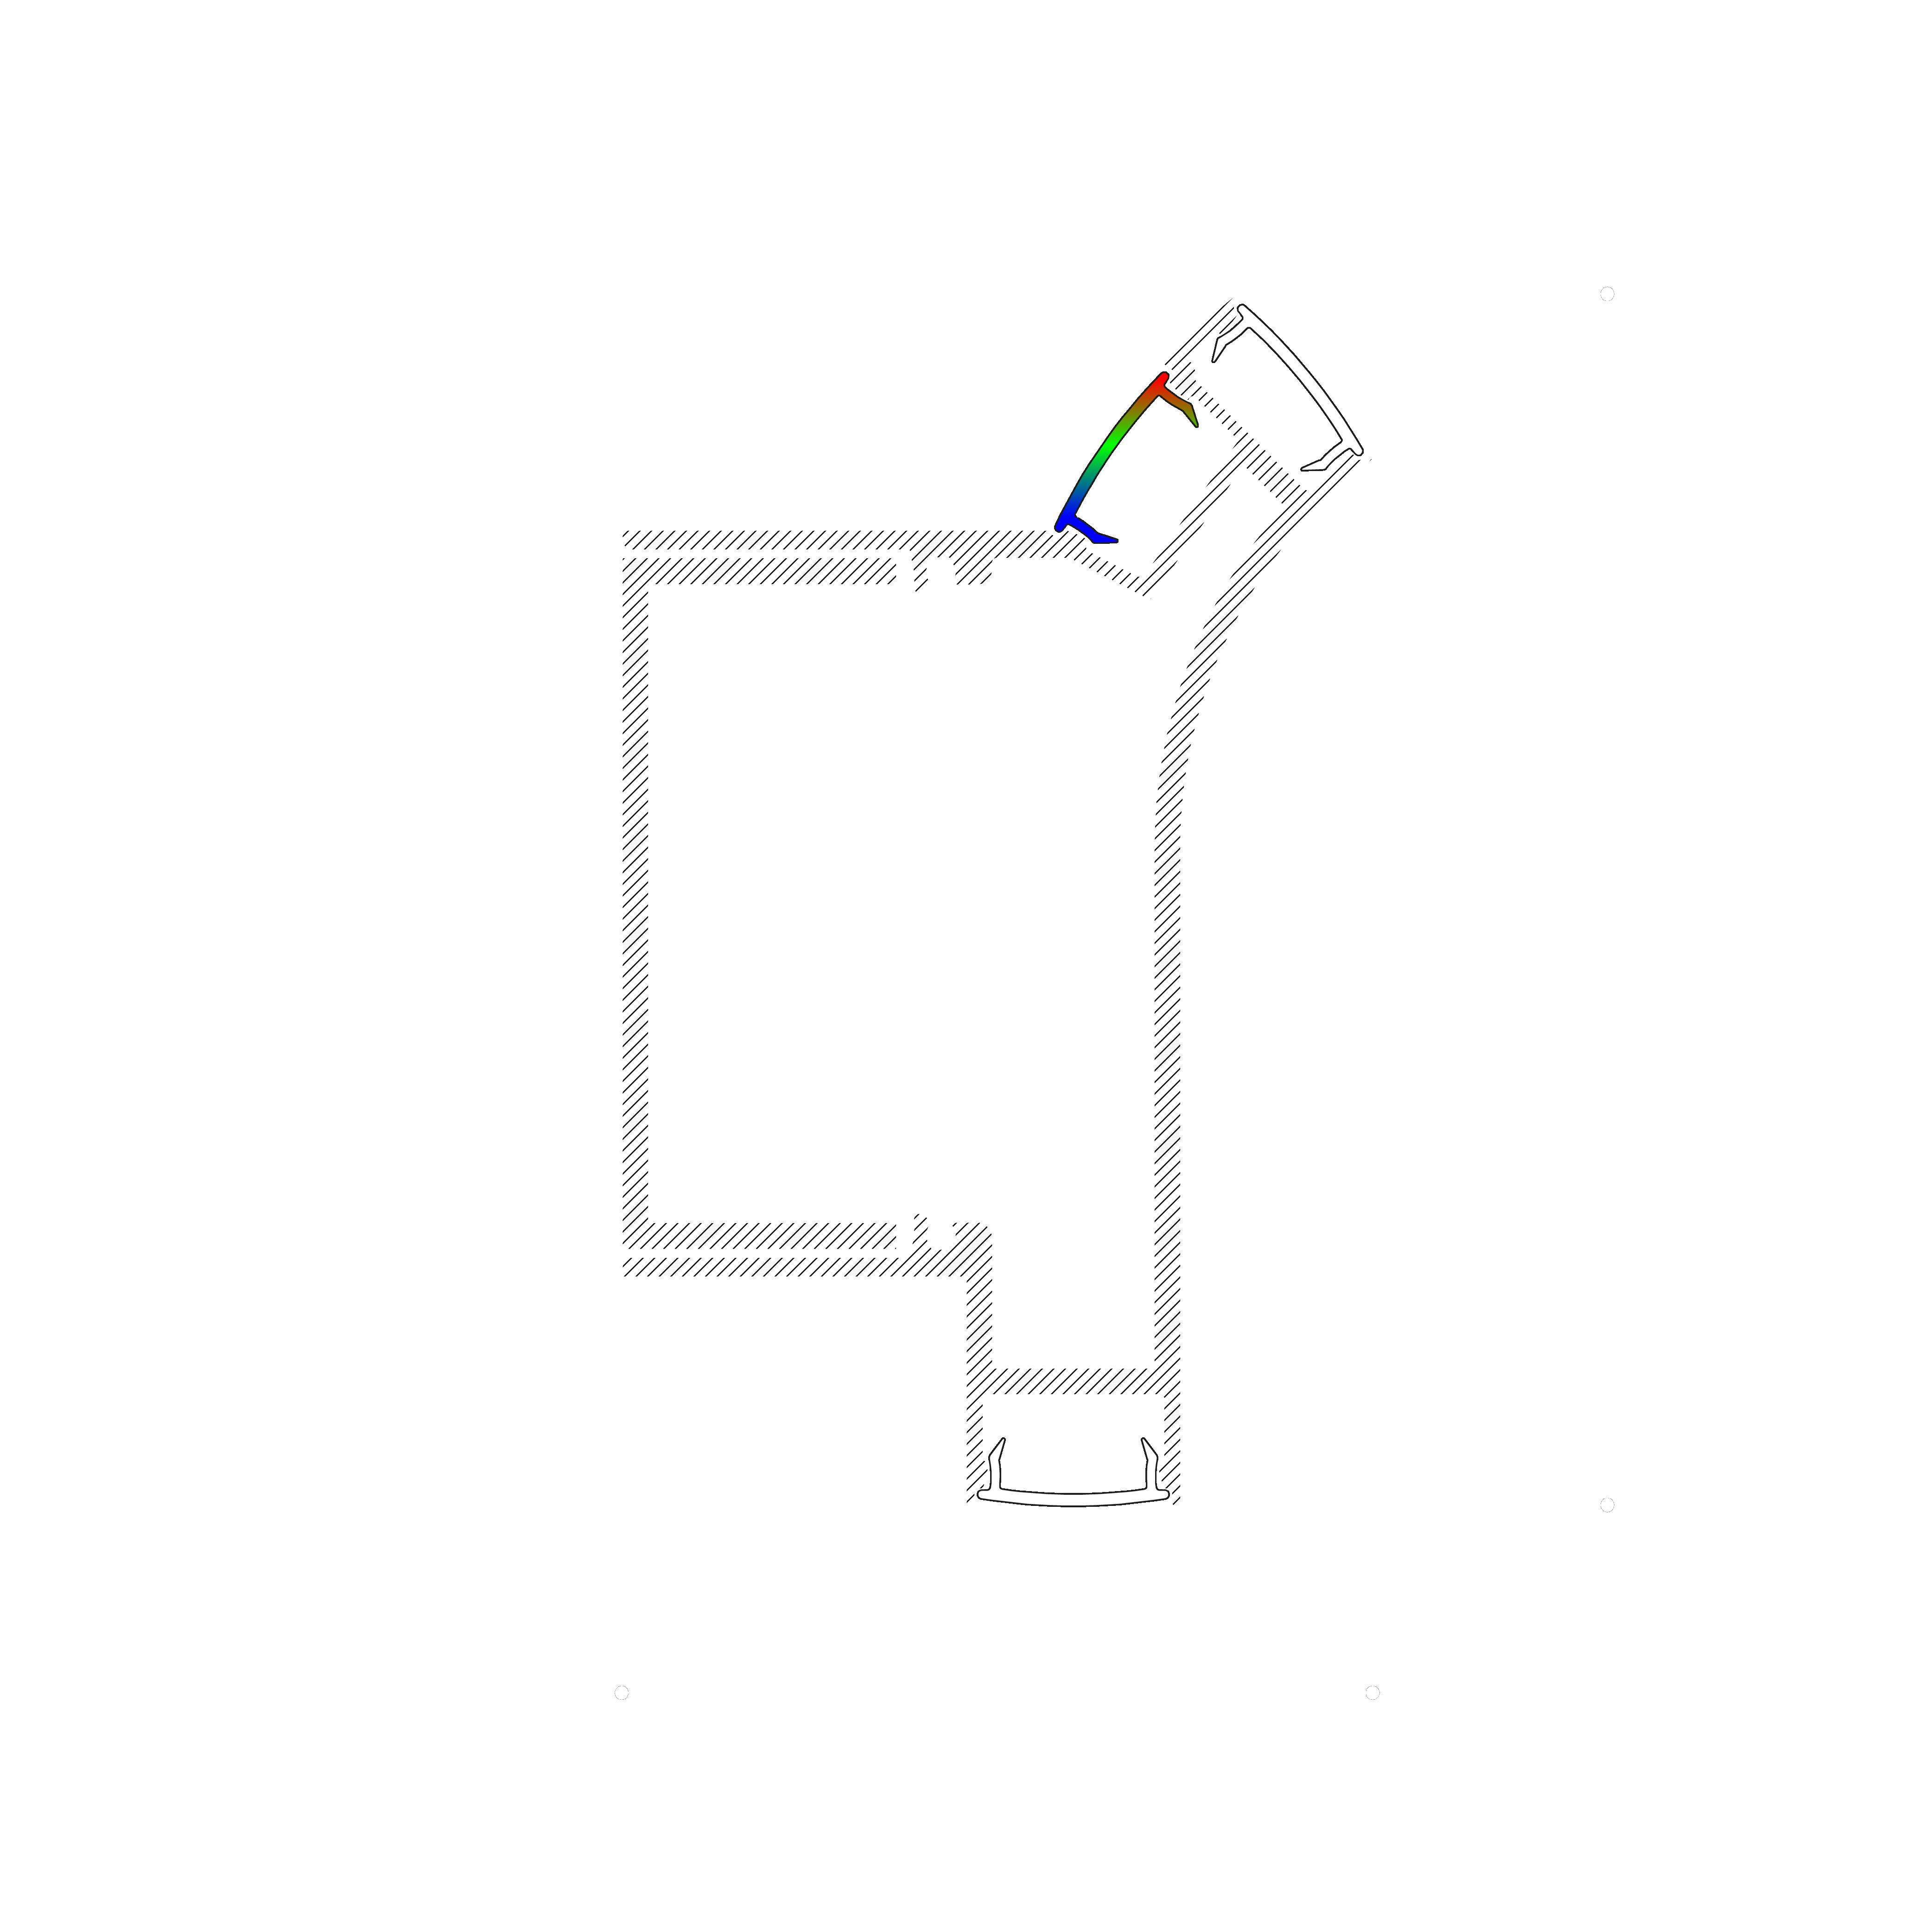 J + RGB.png